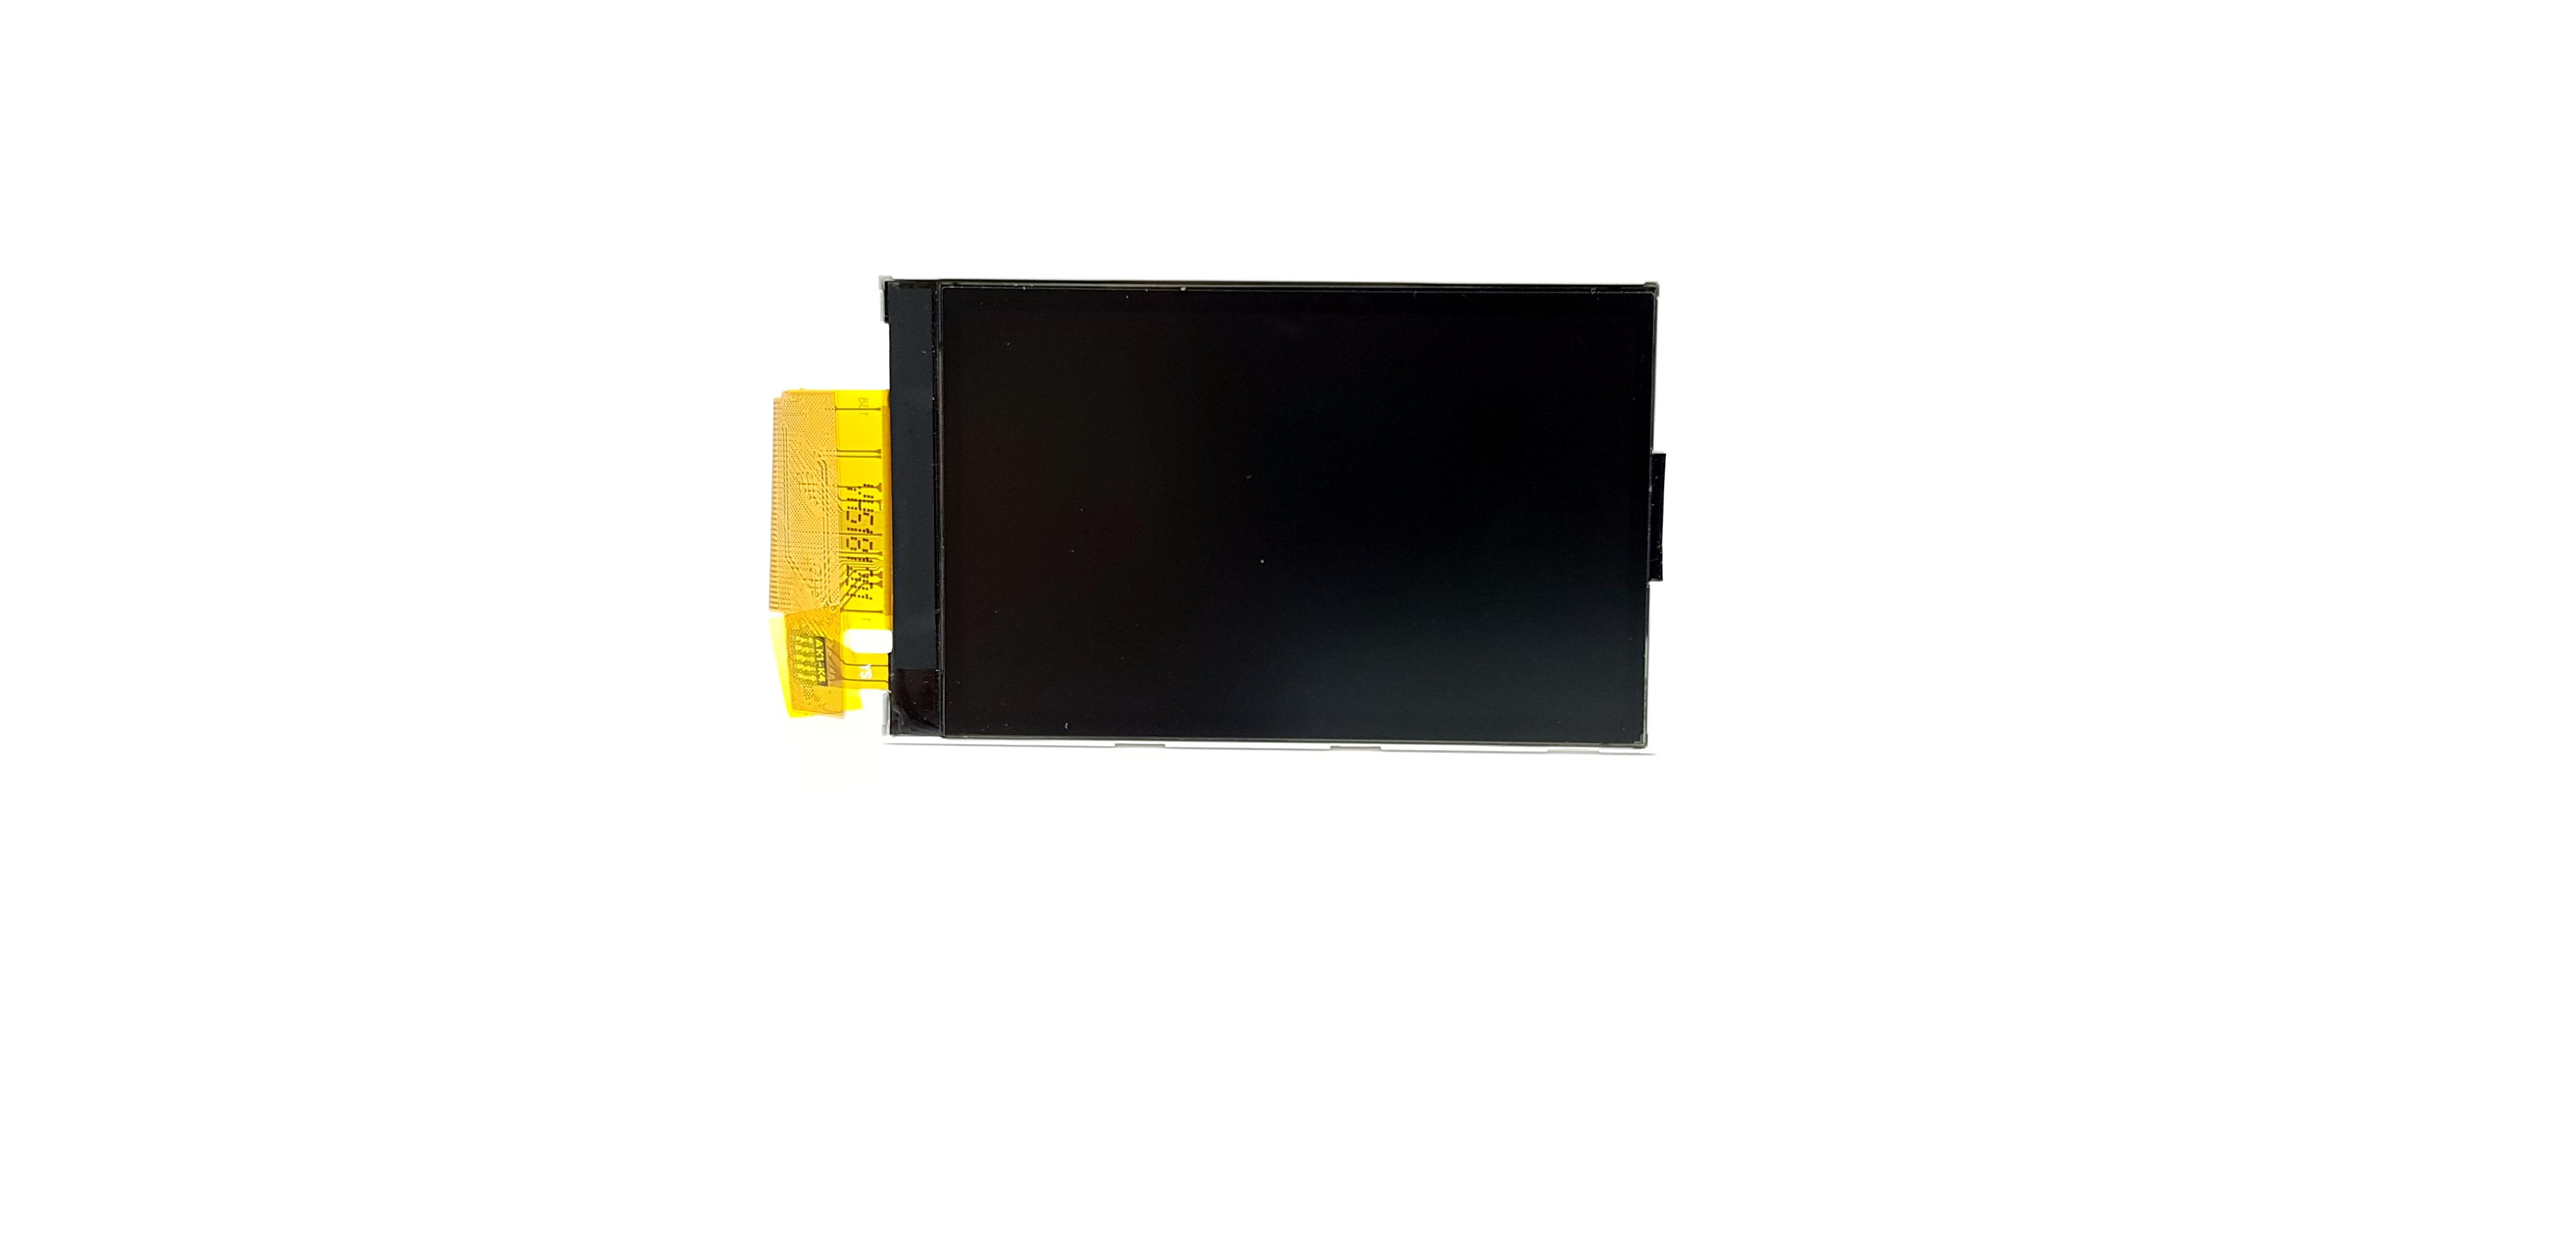 Dreambox DM900 UHD / DM920 UHD LCD Display